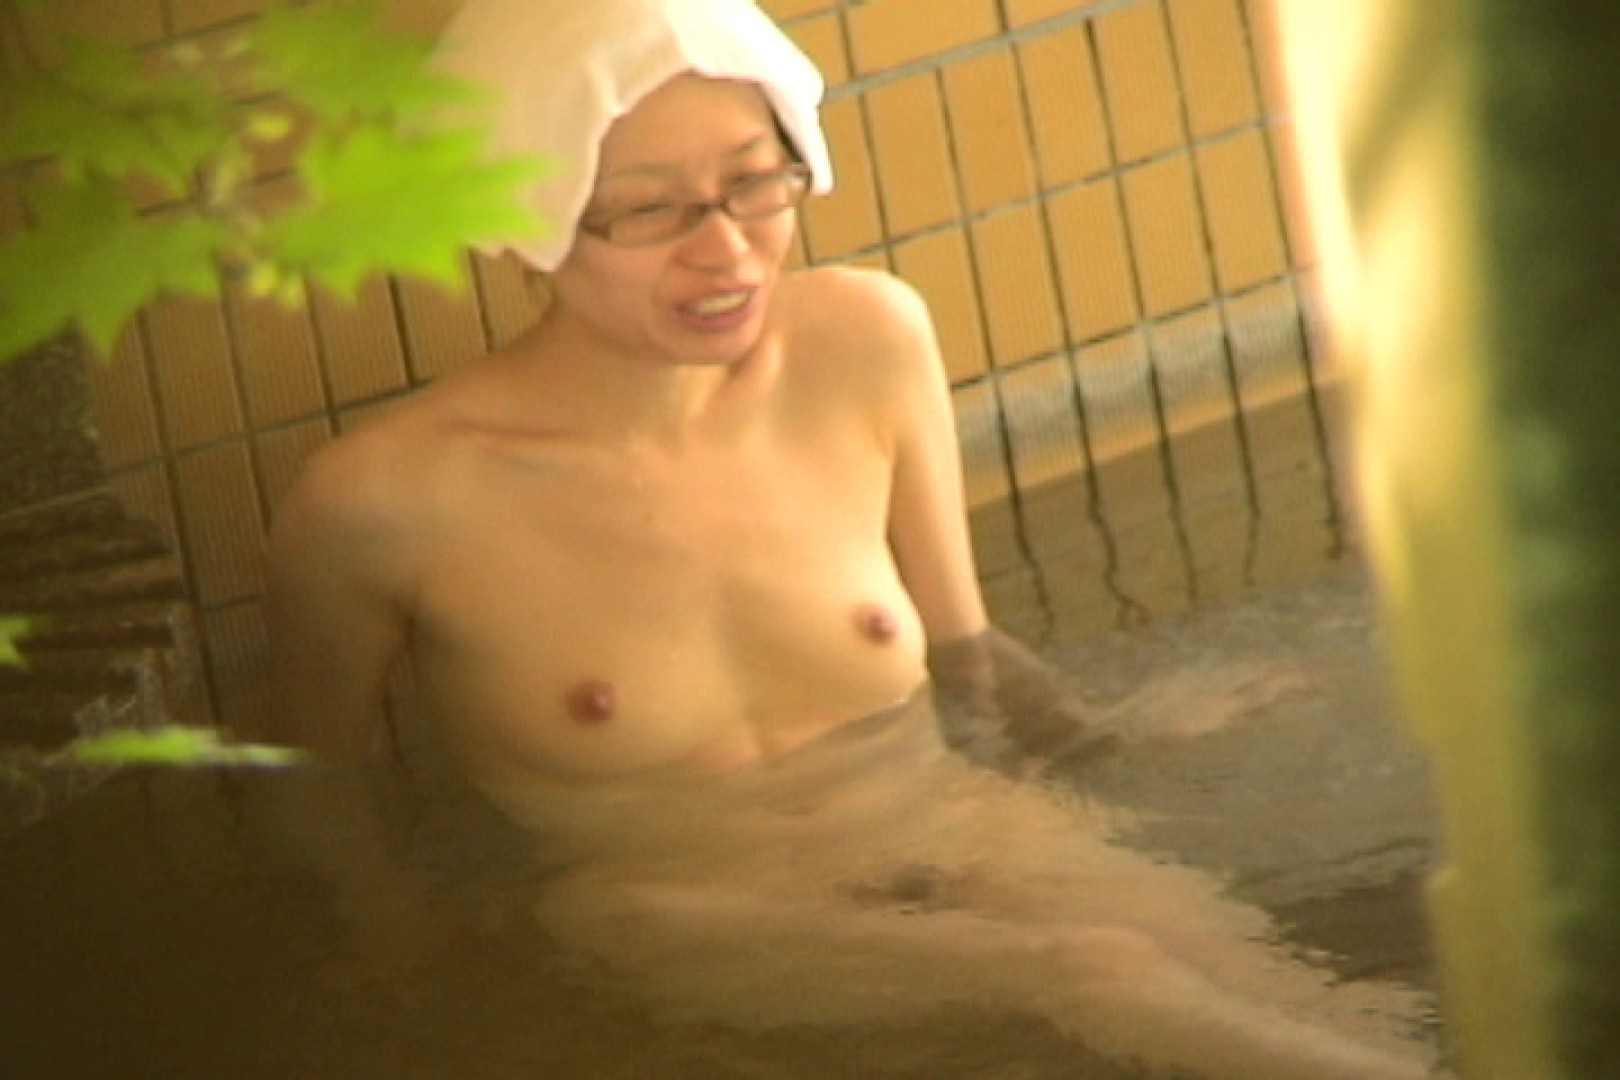 Aquaな露天風呂Vol.703 露天風呂 オメコ無修正動画無料 39連発 26